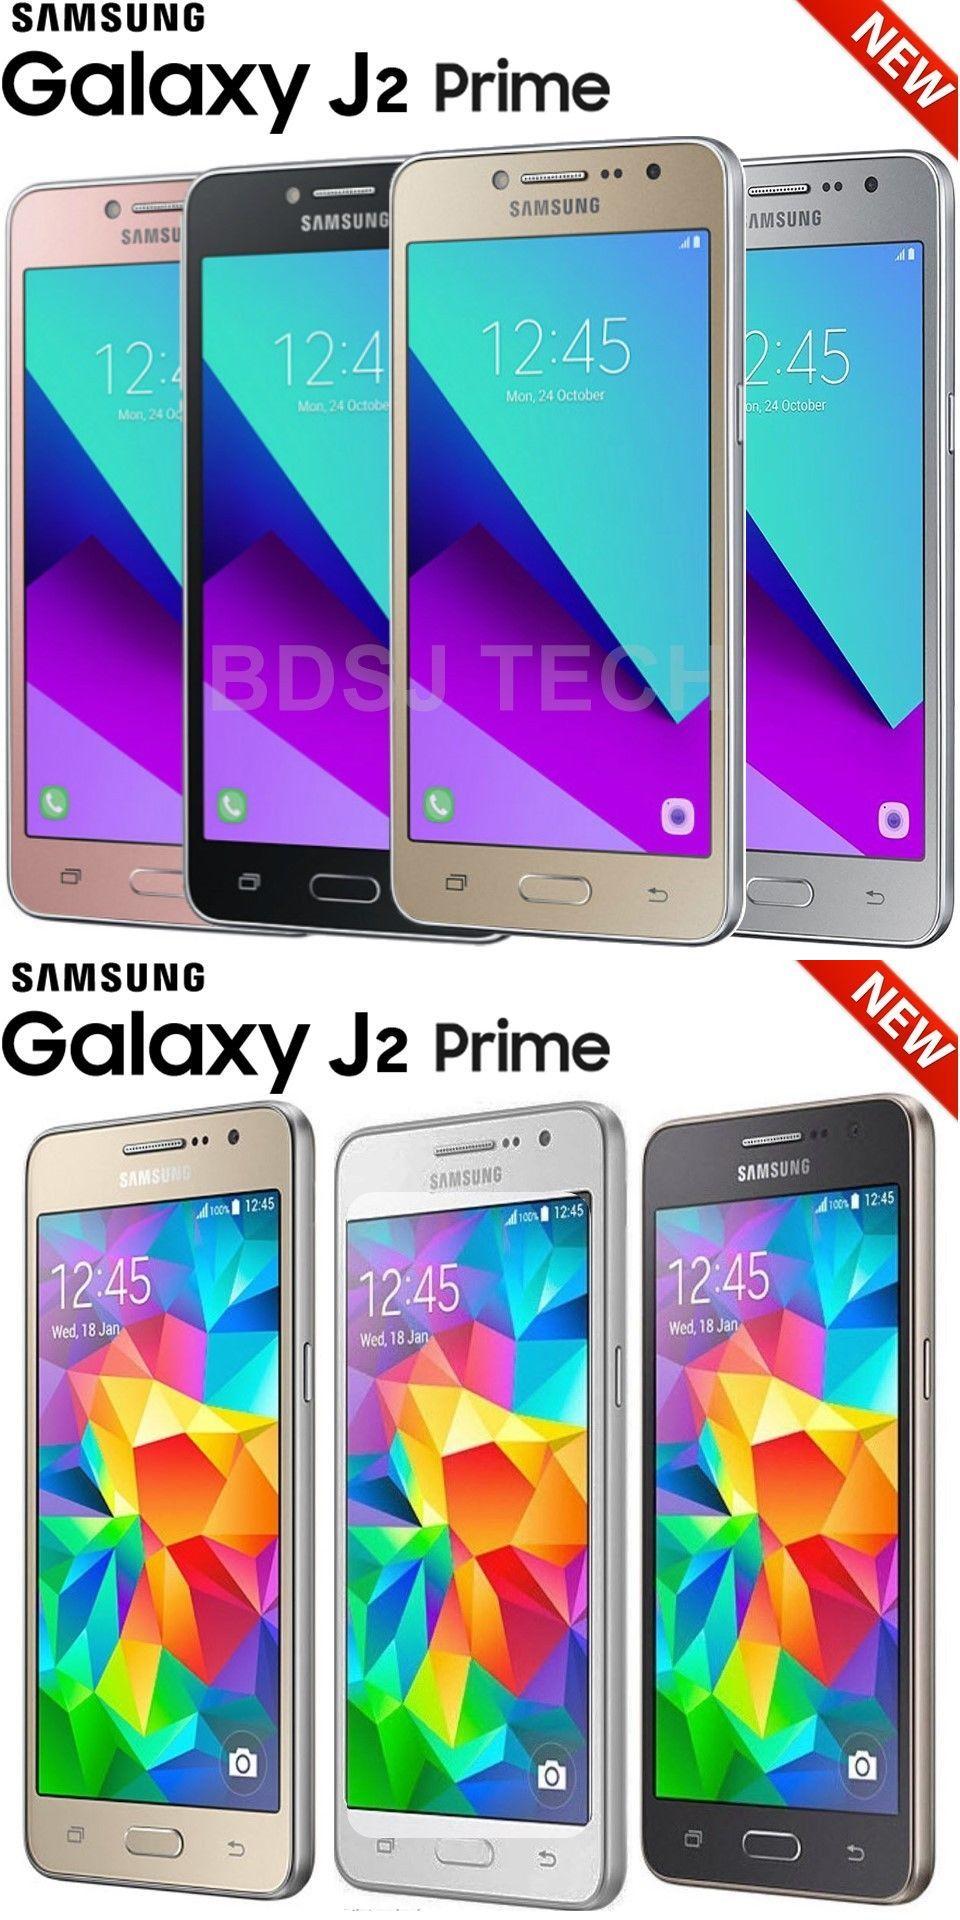 Samsung Galaxy J2 Prime 16gb G532m Ds 5 4g Lte Dual Sim Gsm Factory Unlocked Ebay Dual Sim Prepaid Phones Samsung Cell Phones